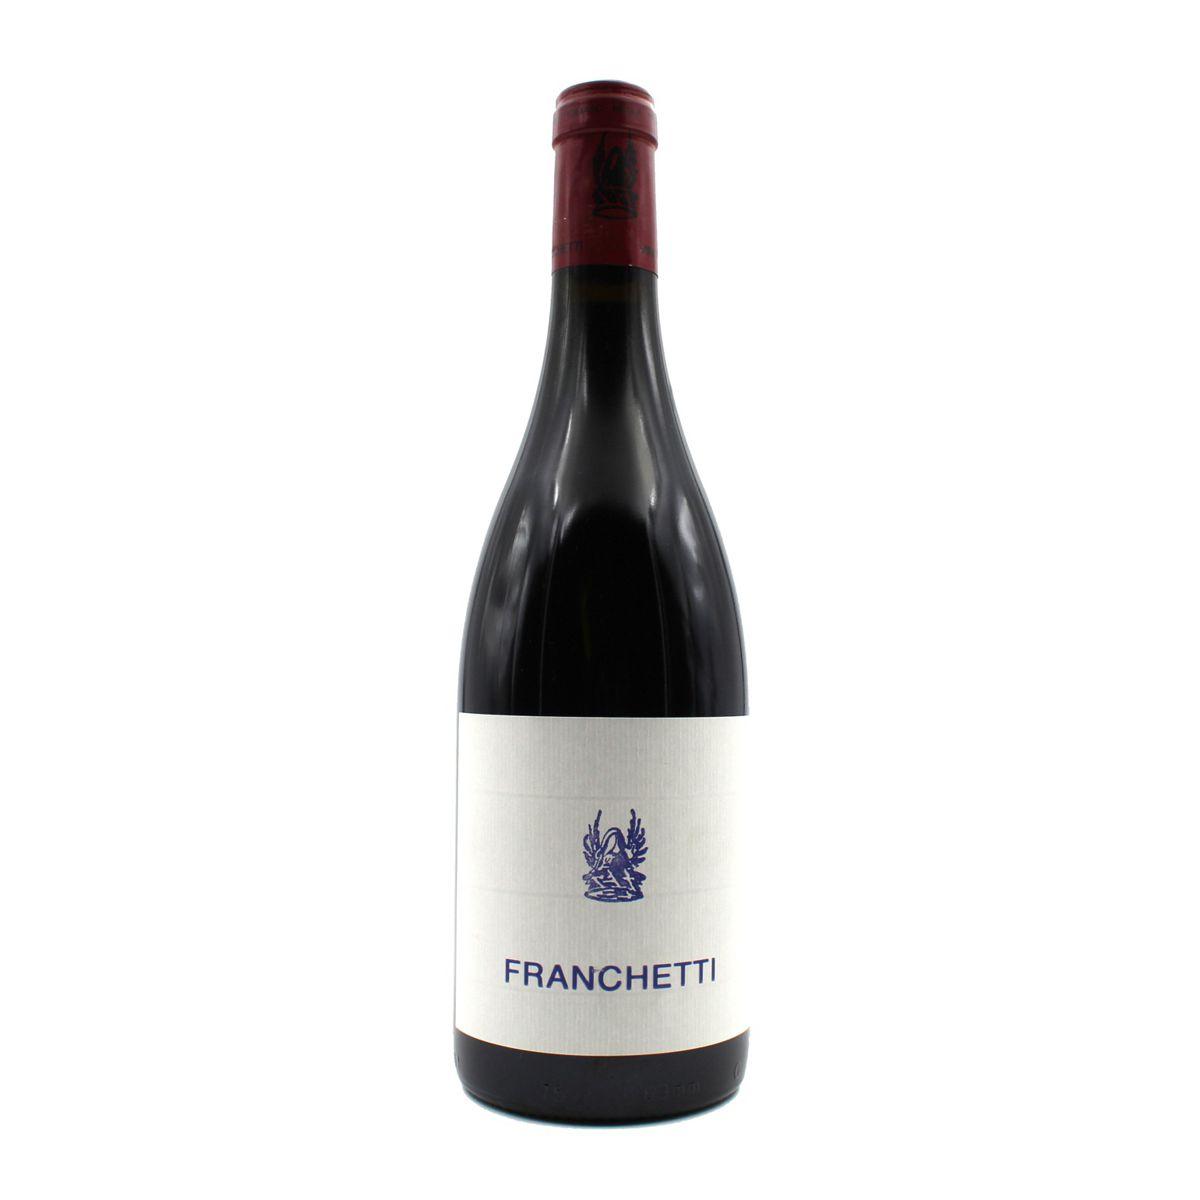 Franchetti 2017 Vini Franchetti